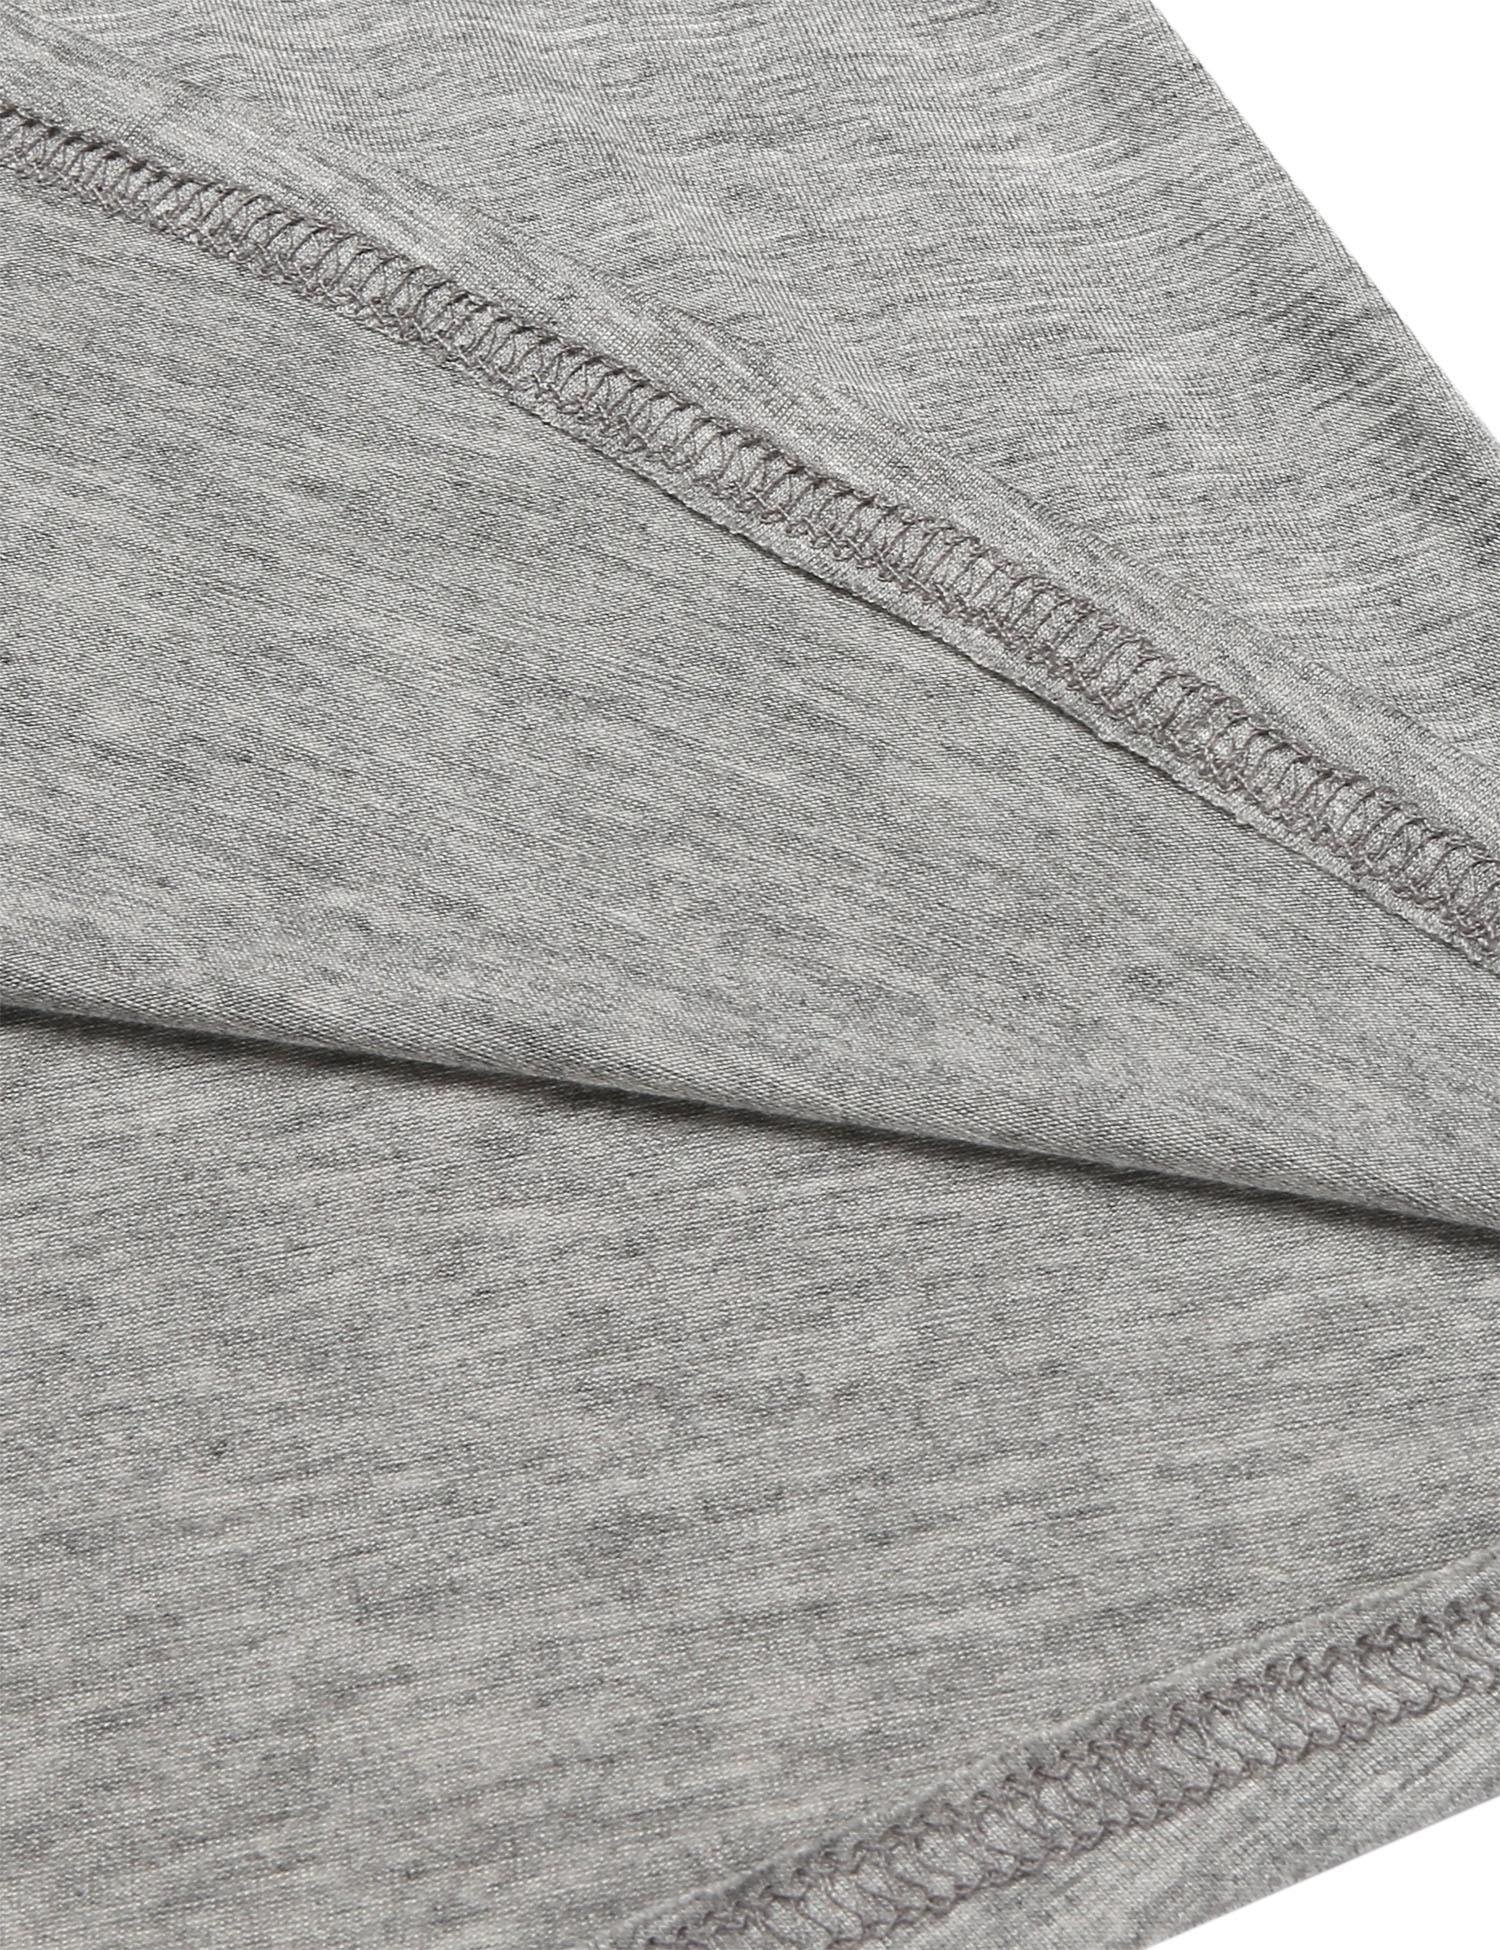 Ekouaer Babydoll Chemise Womens Viscose Knit Sleepwear Nightshirt Slip Grey S